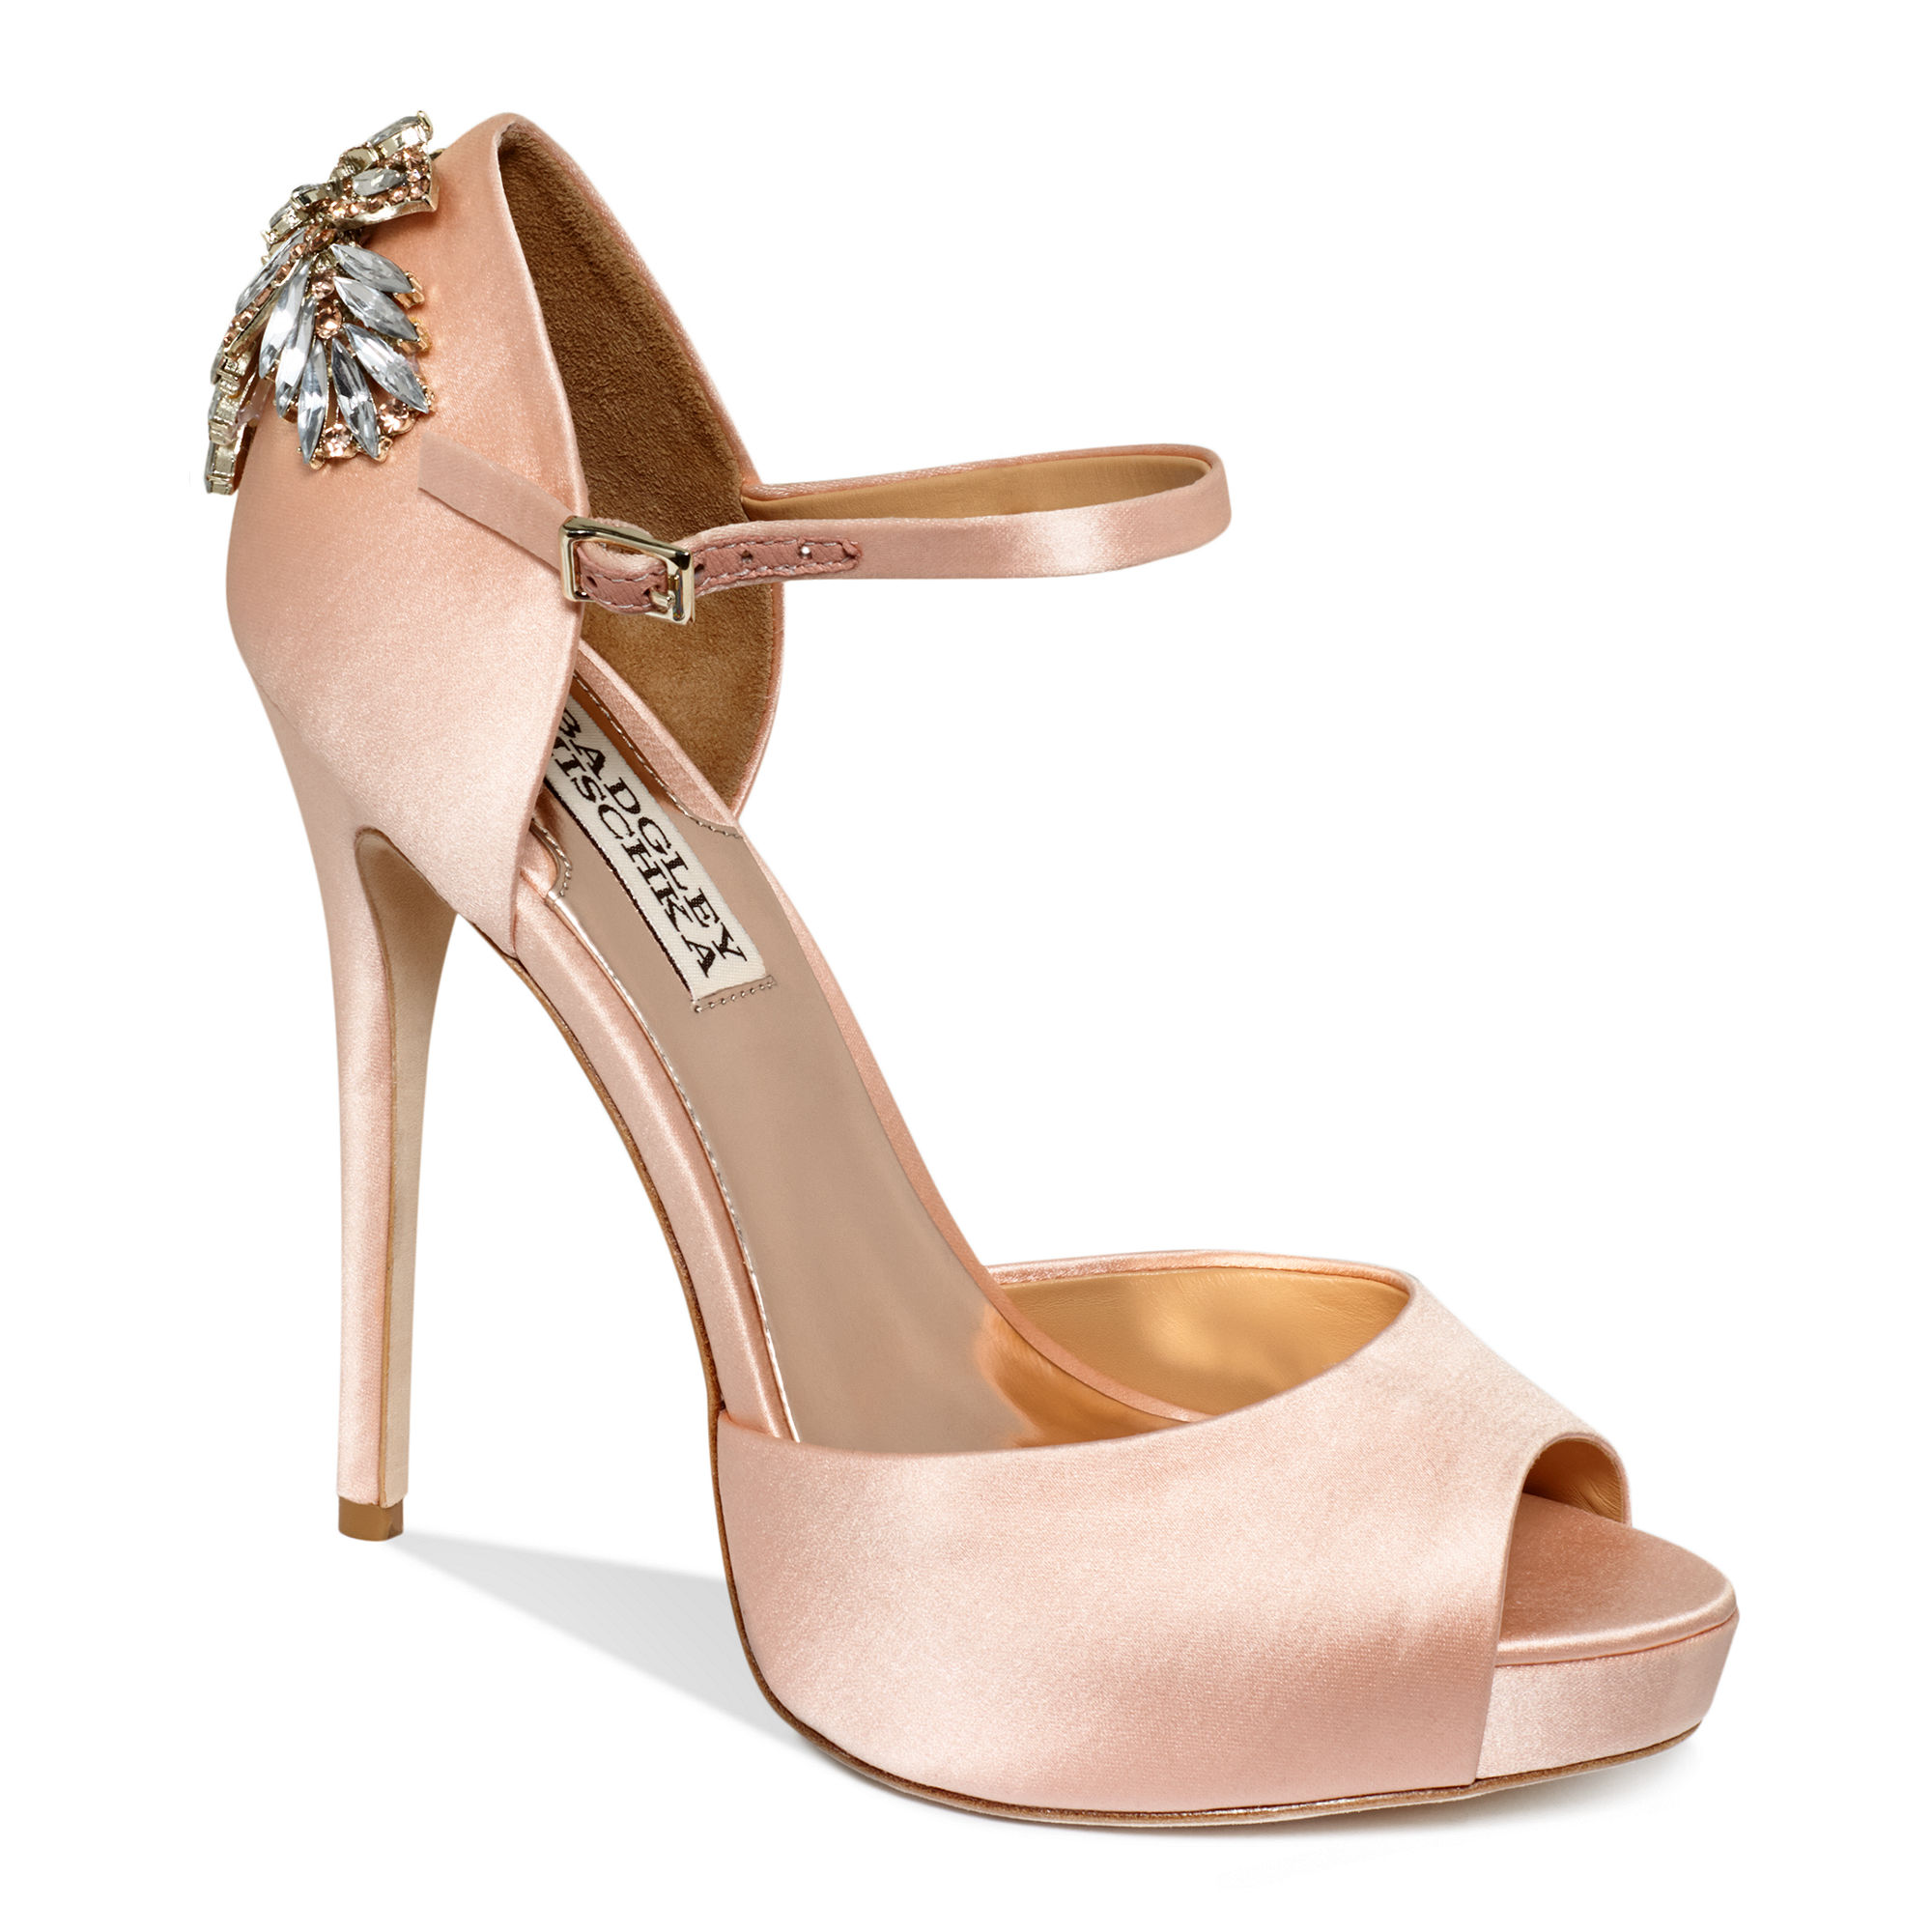 Lyst Badgley Mischka Nessa High Heel Evening Pumps In Pink